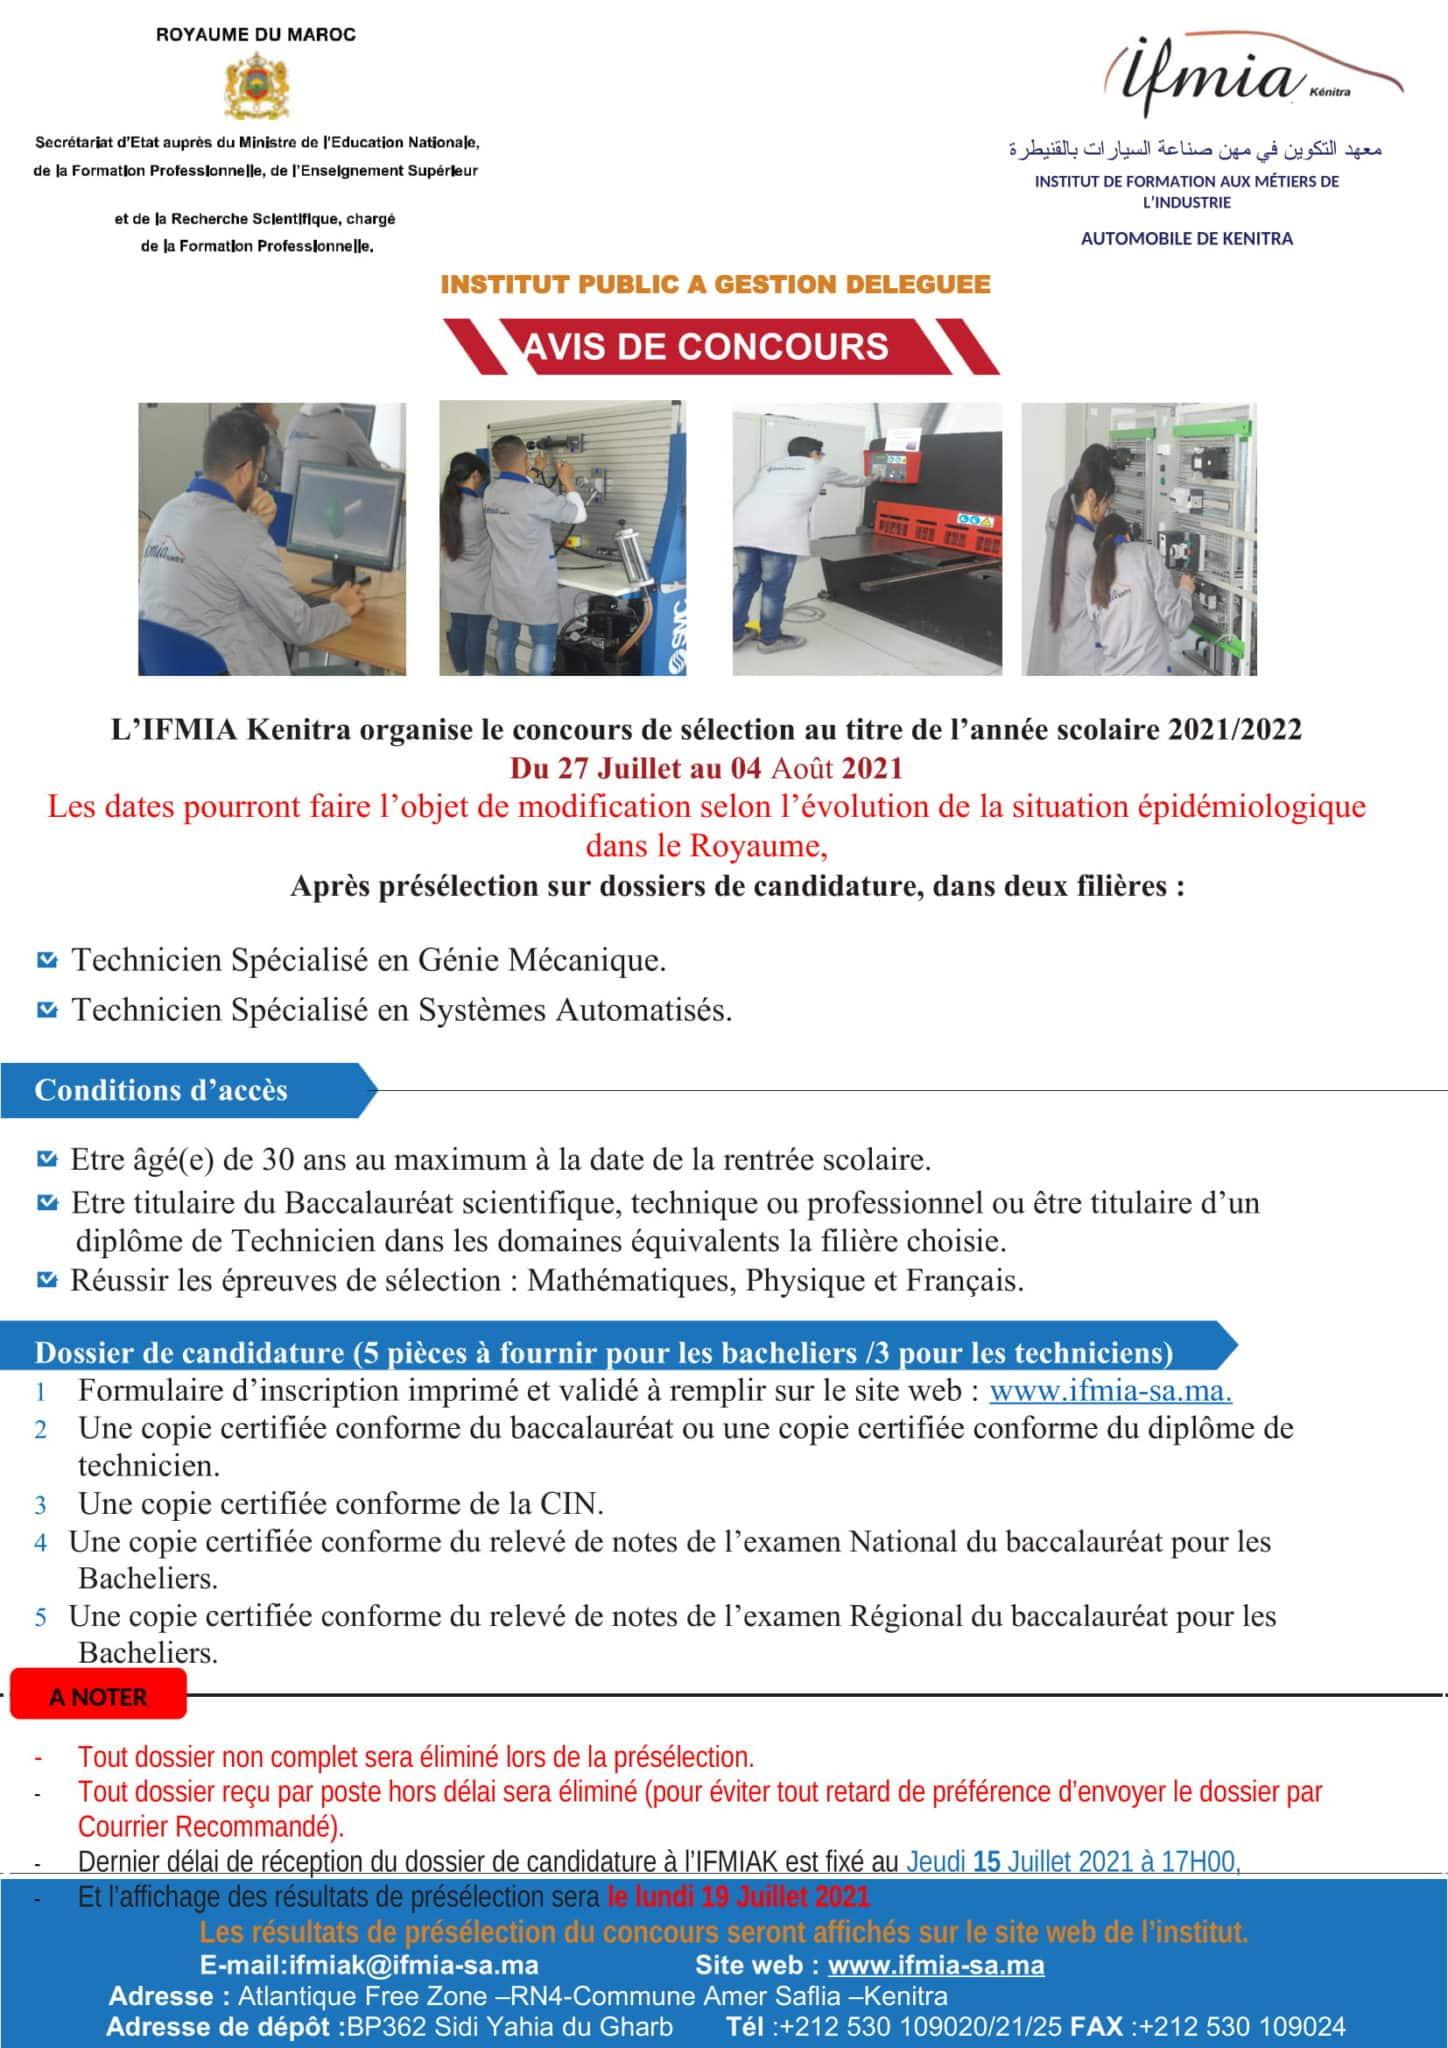 inscription concours ifmia kenitra scaled Résultats Concours IFMIA 2021/2022